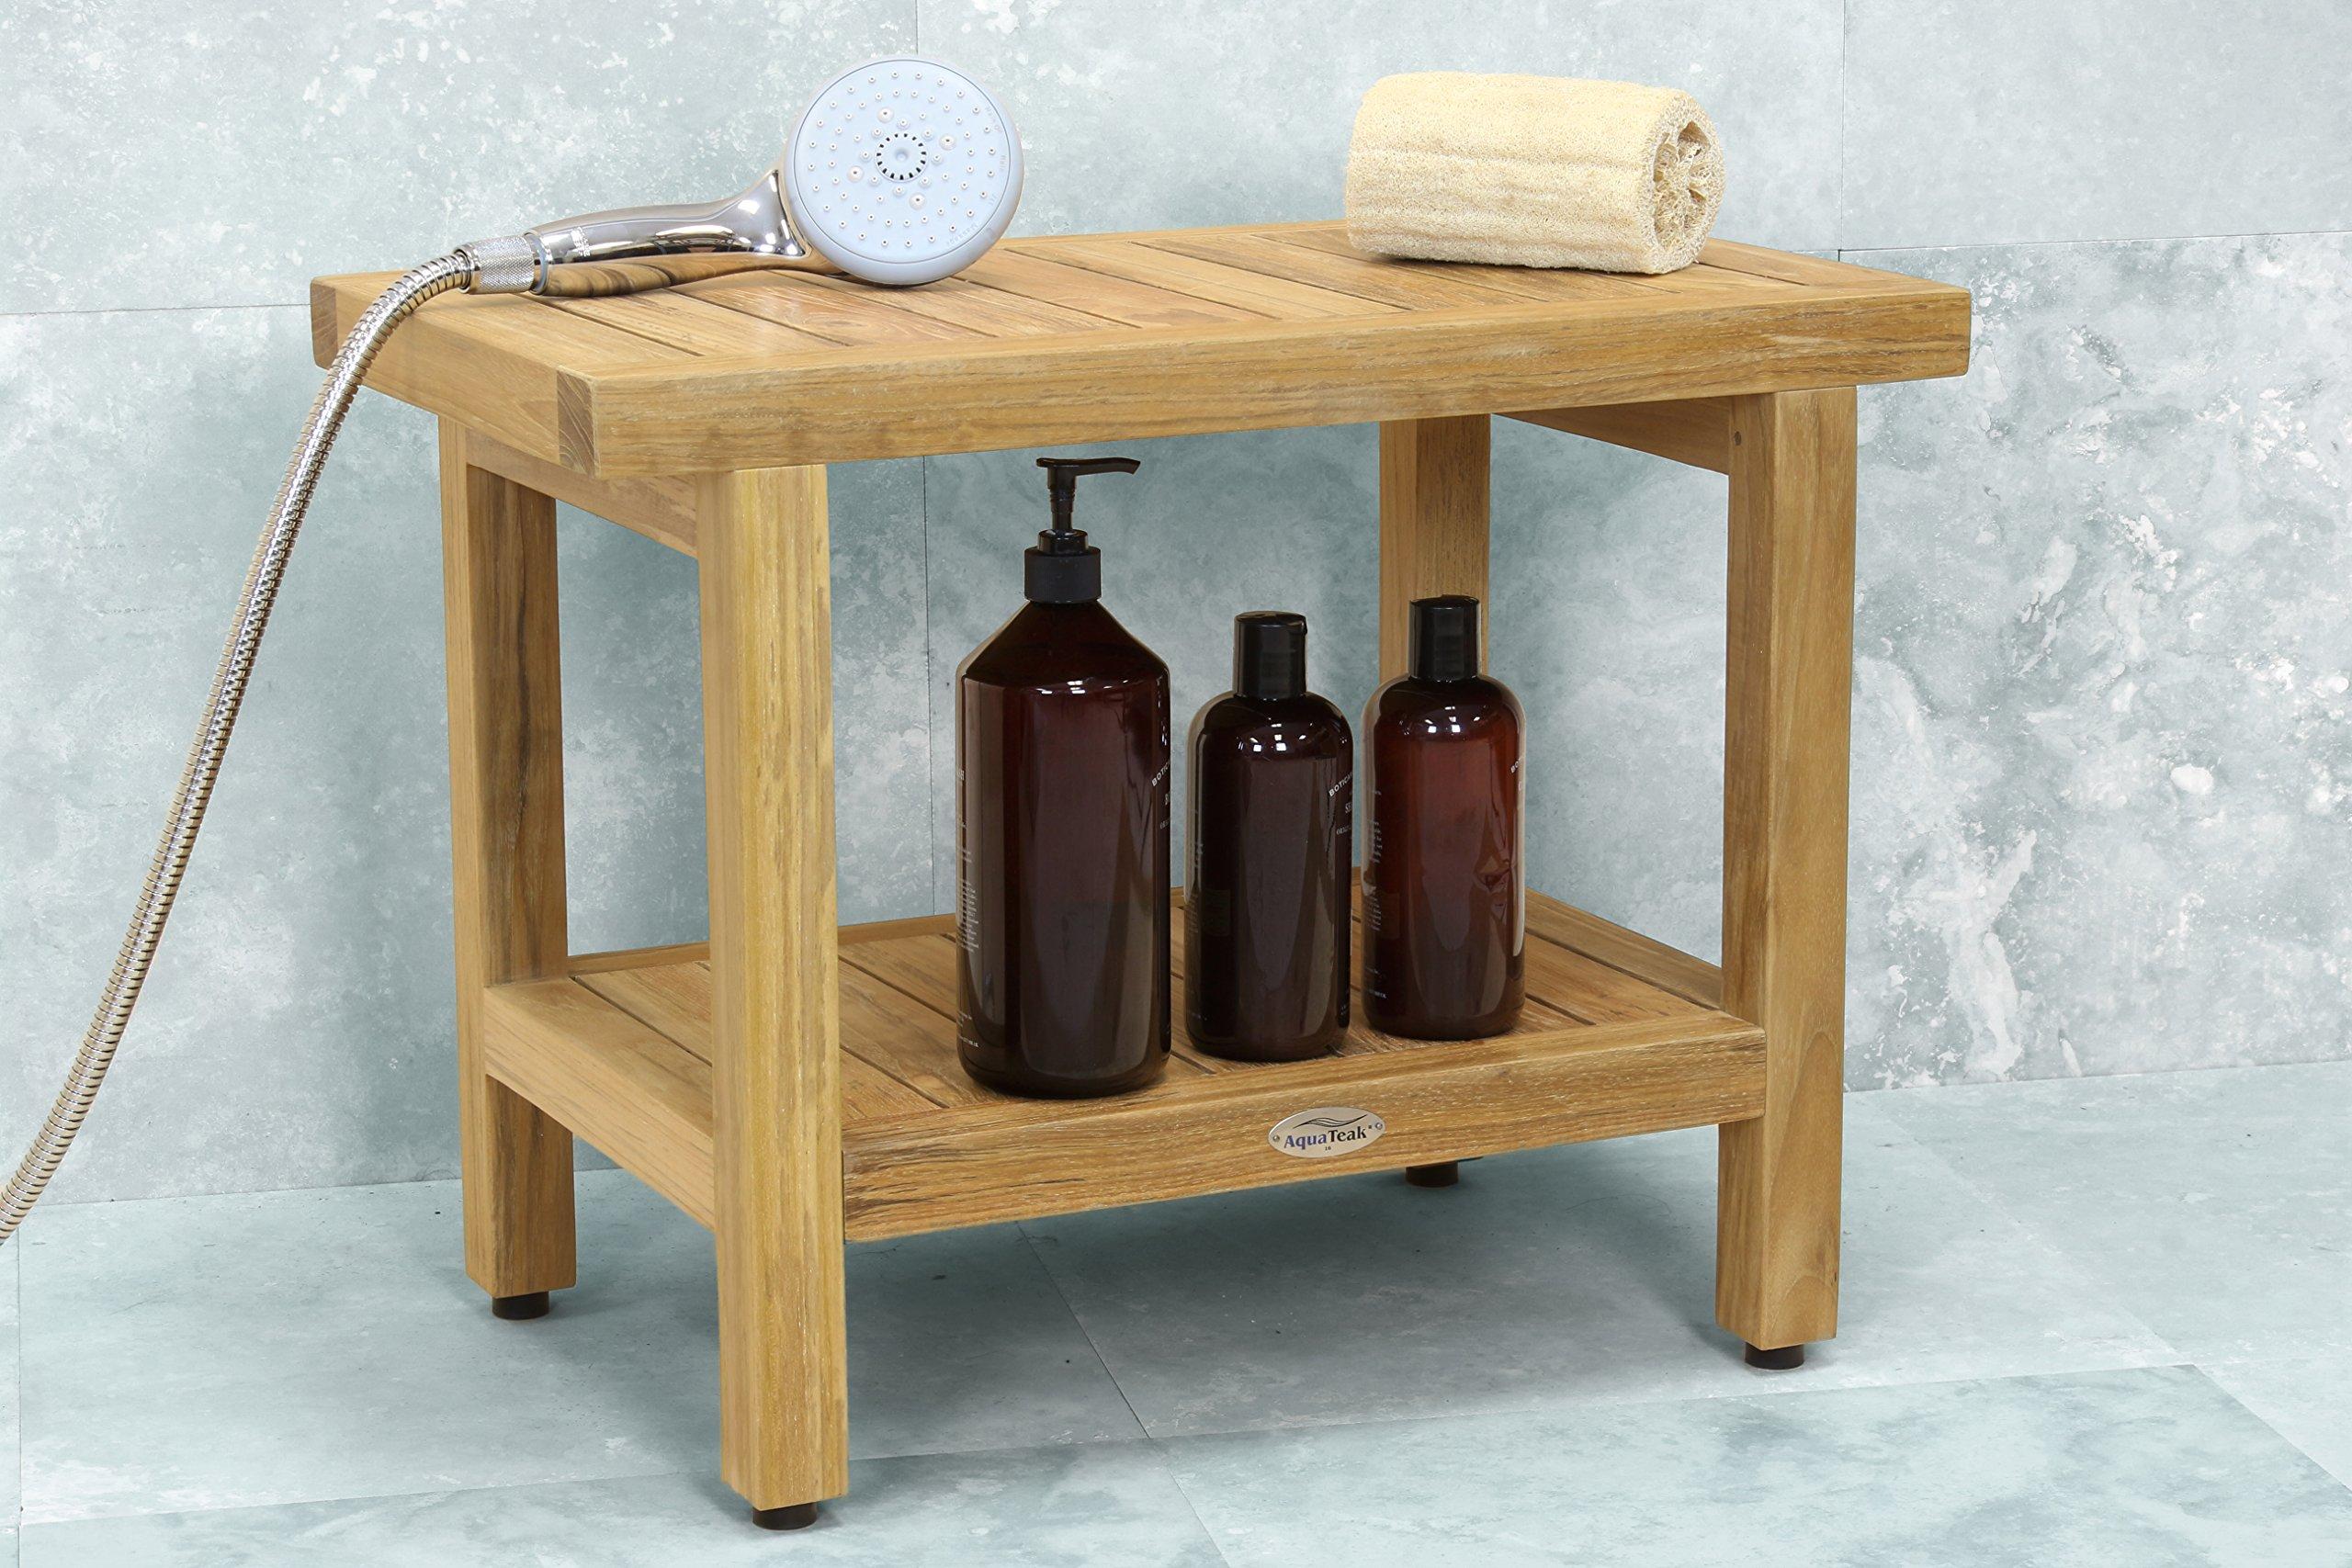 24'' Spa Natural Teak Shower Bench with Shelf by AquaTeak (Image #8)